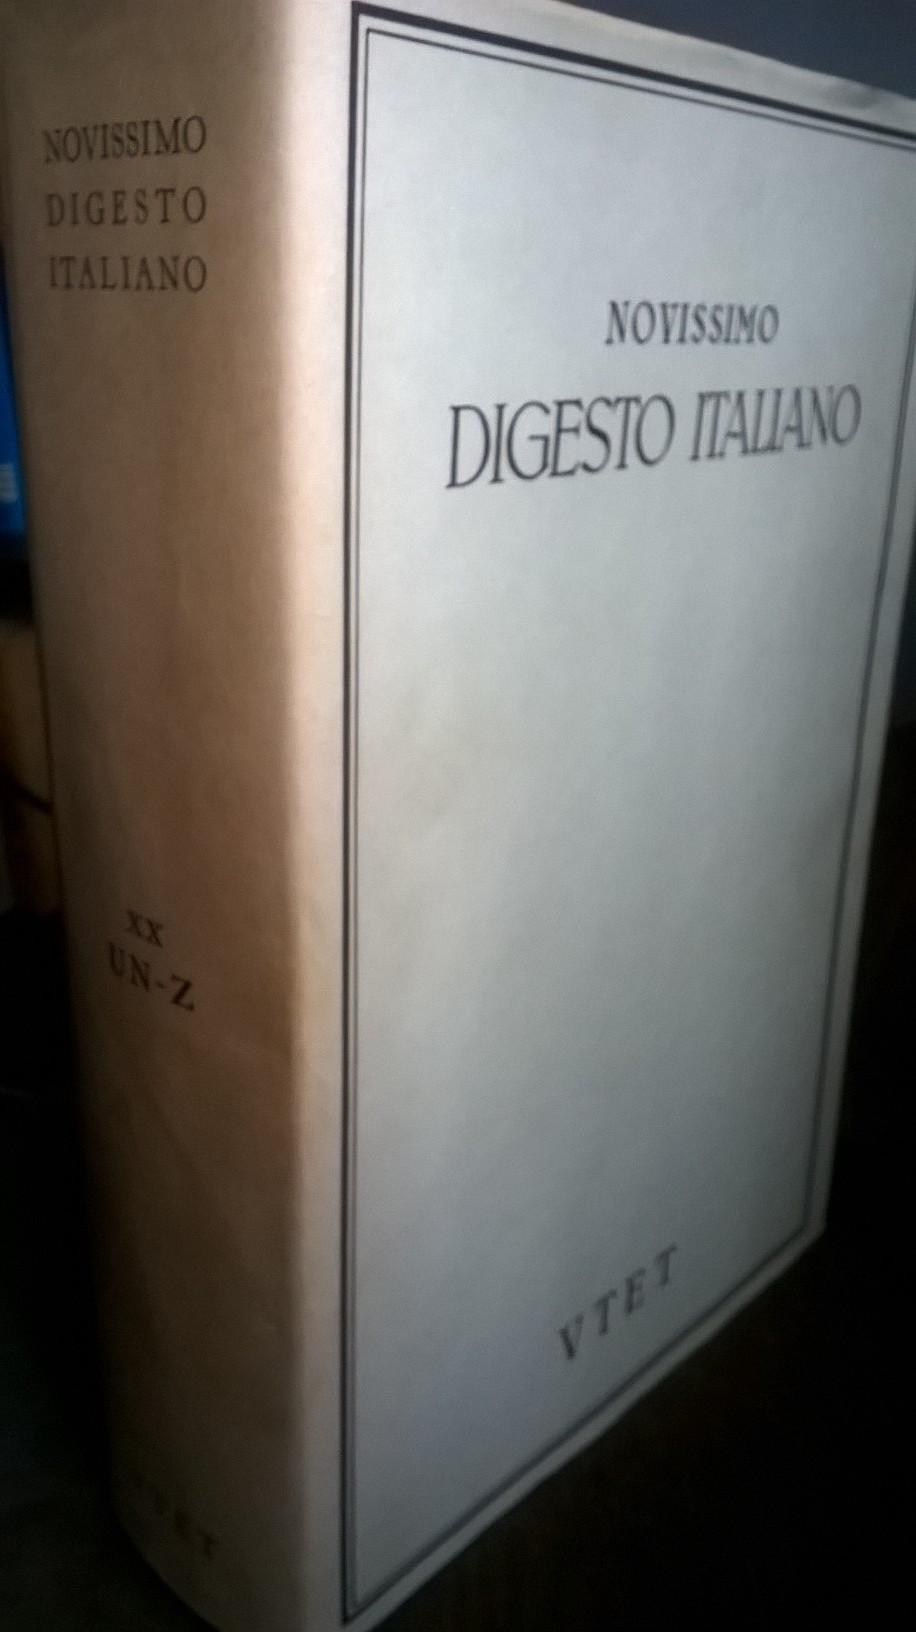 Novissimo digesto italiano - vol. XX